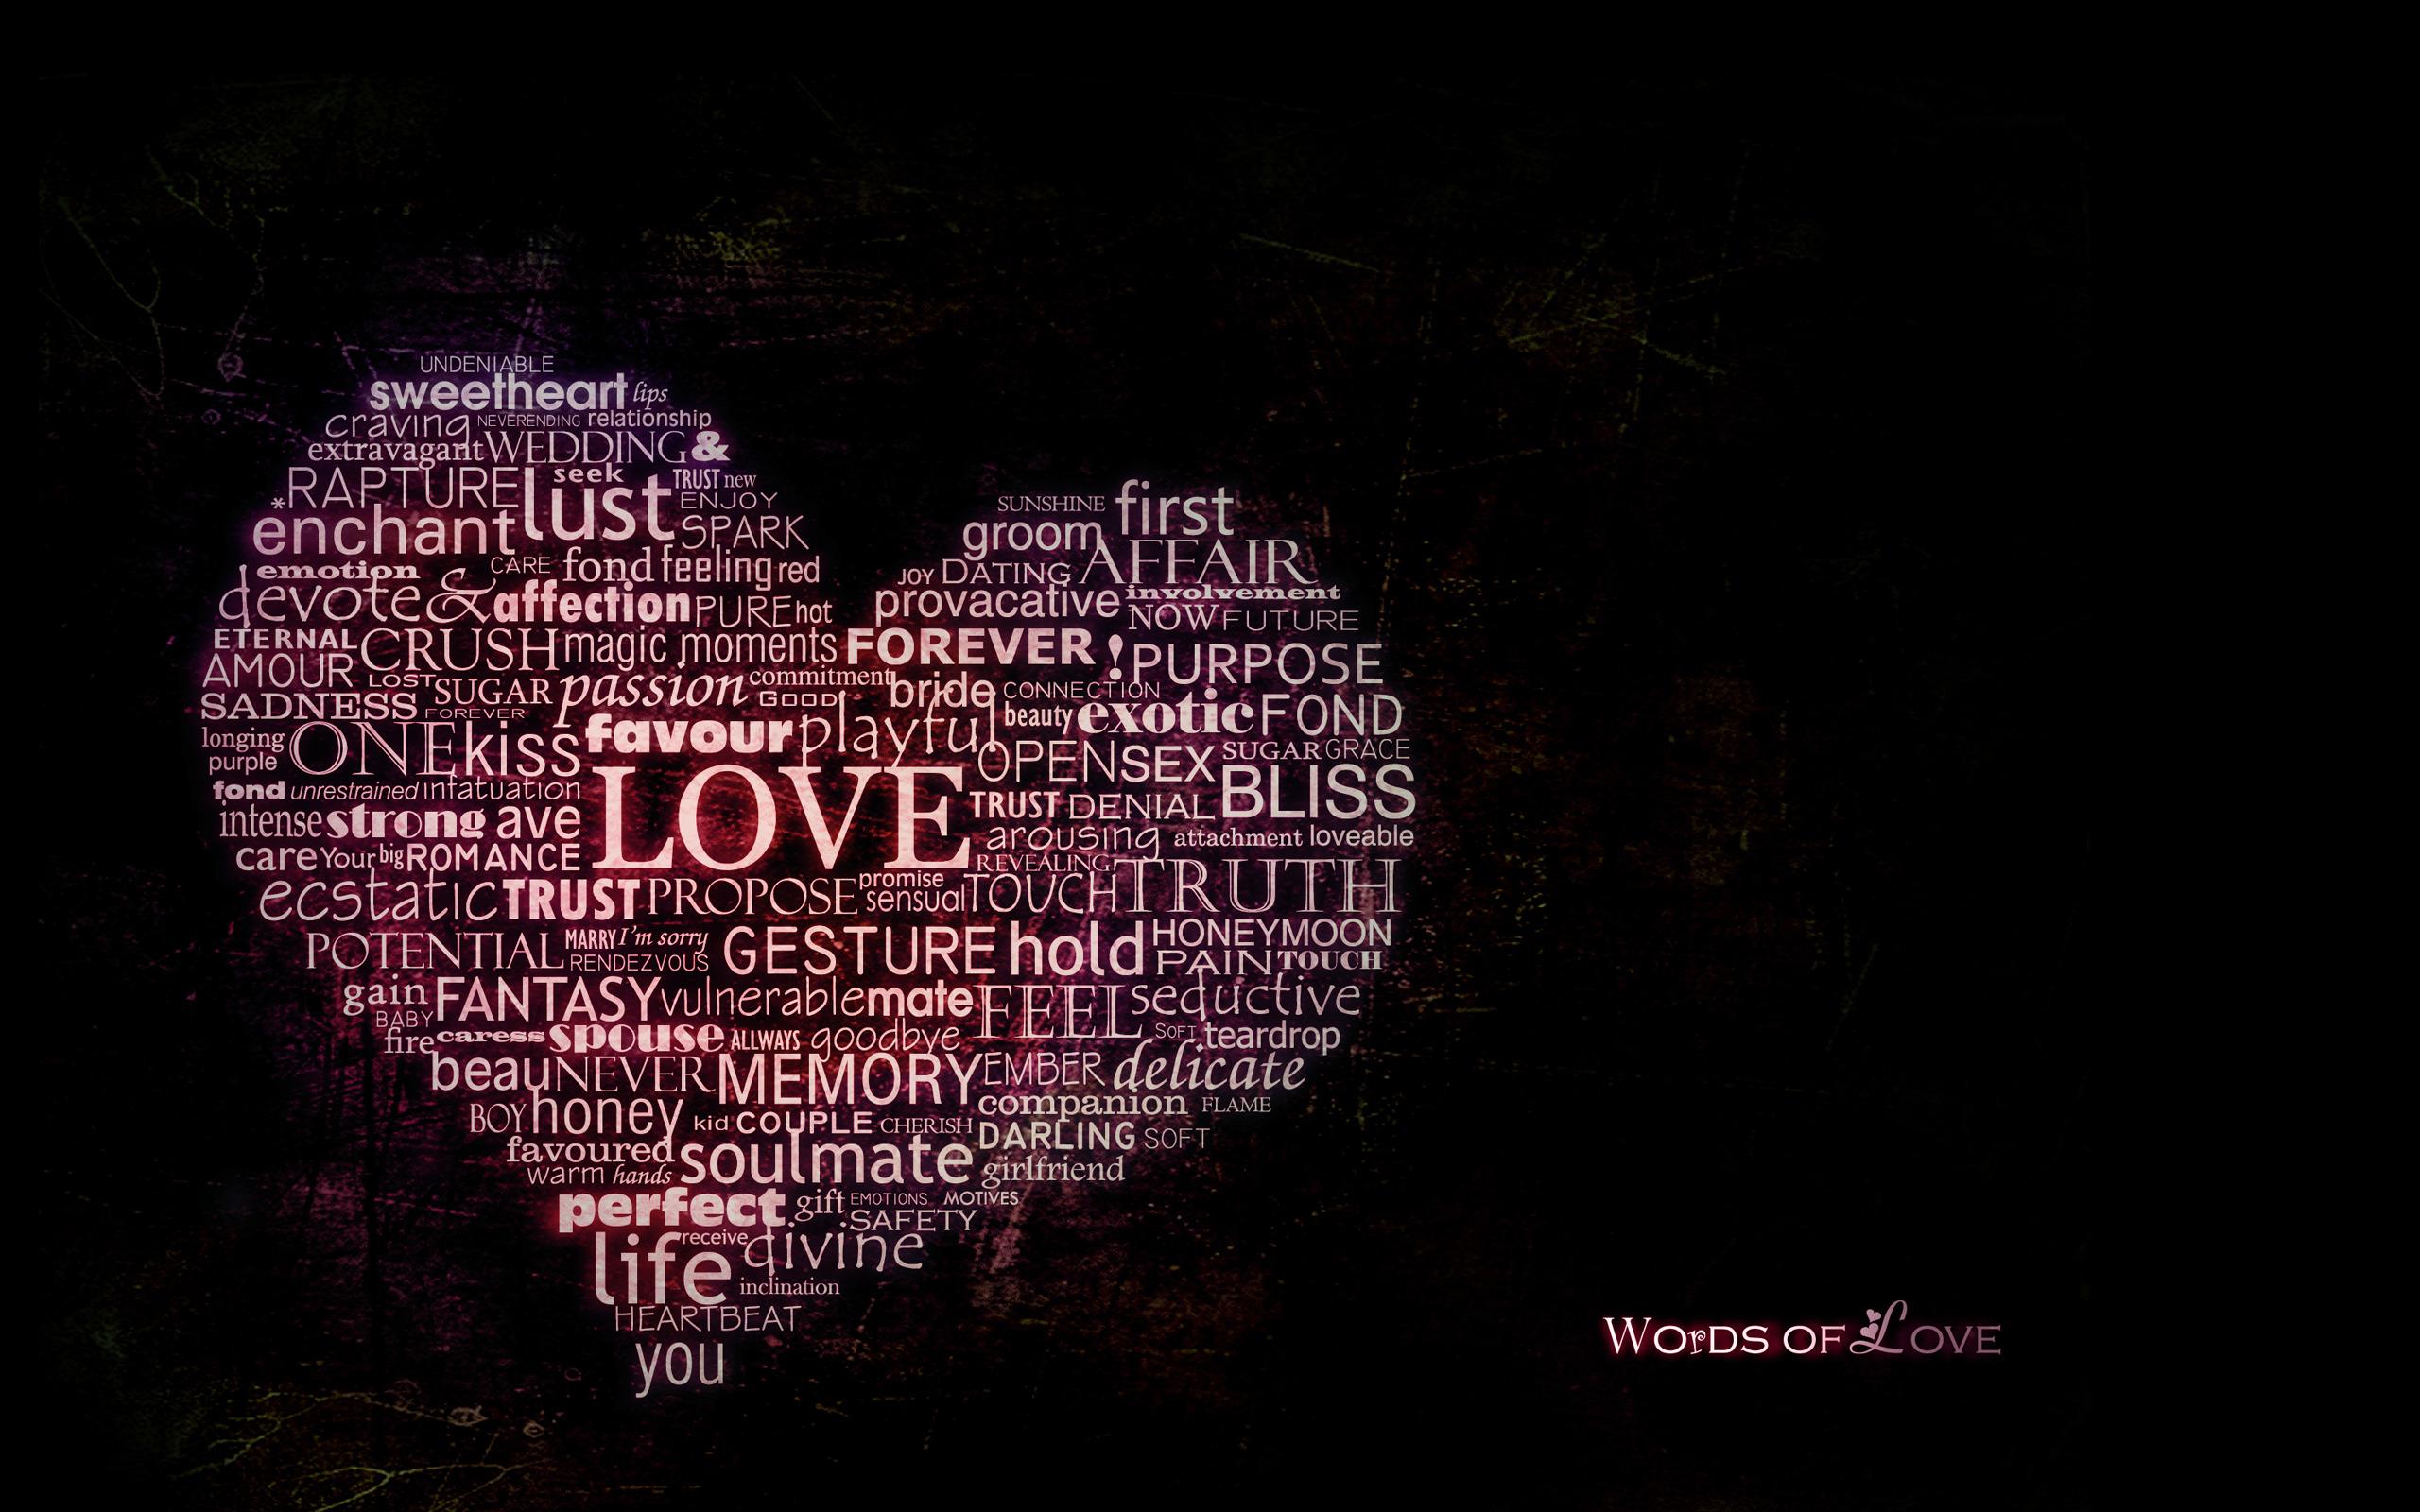 Hd Wallpaper Background Image Id X Artistic Love